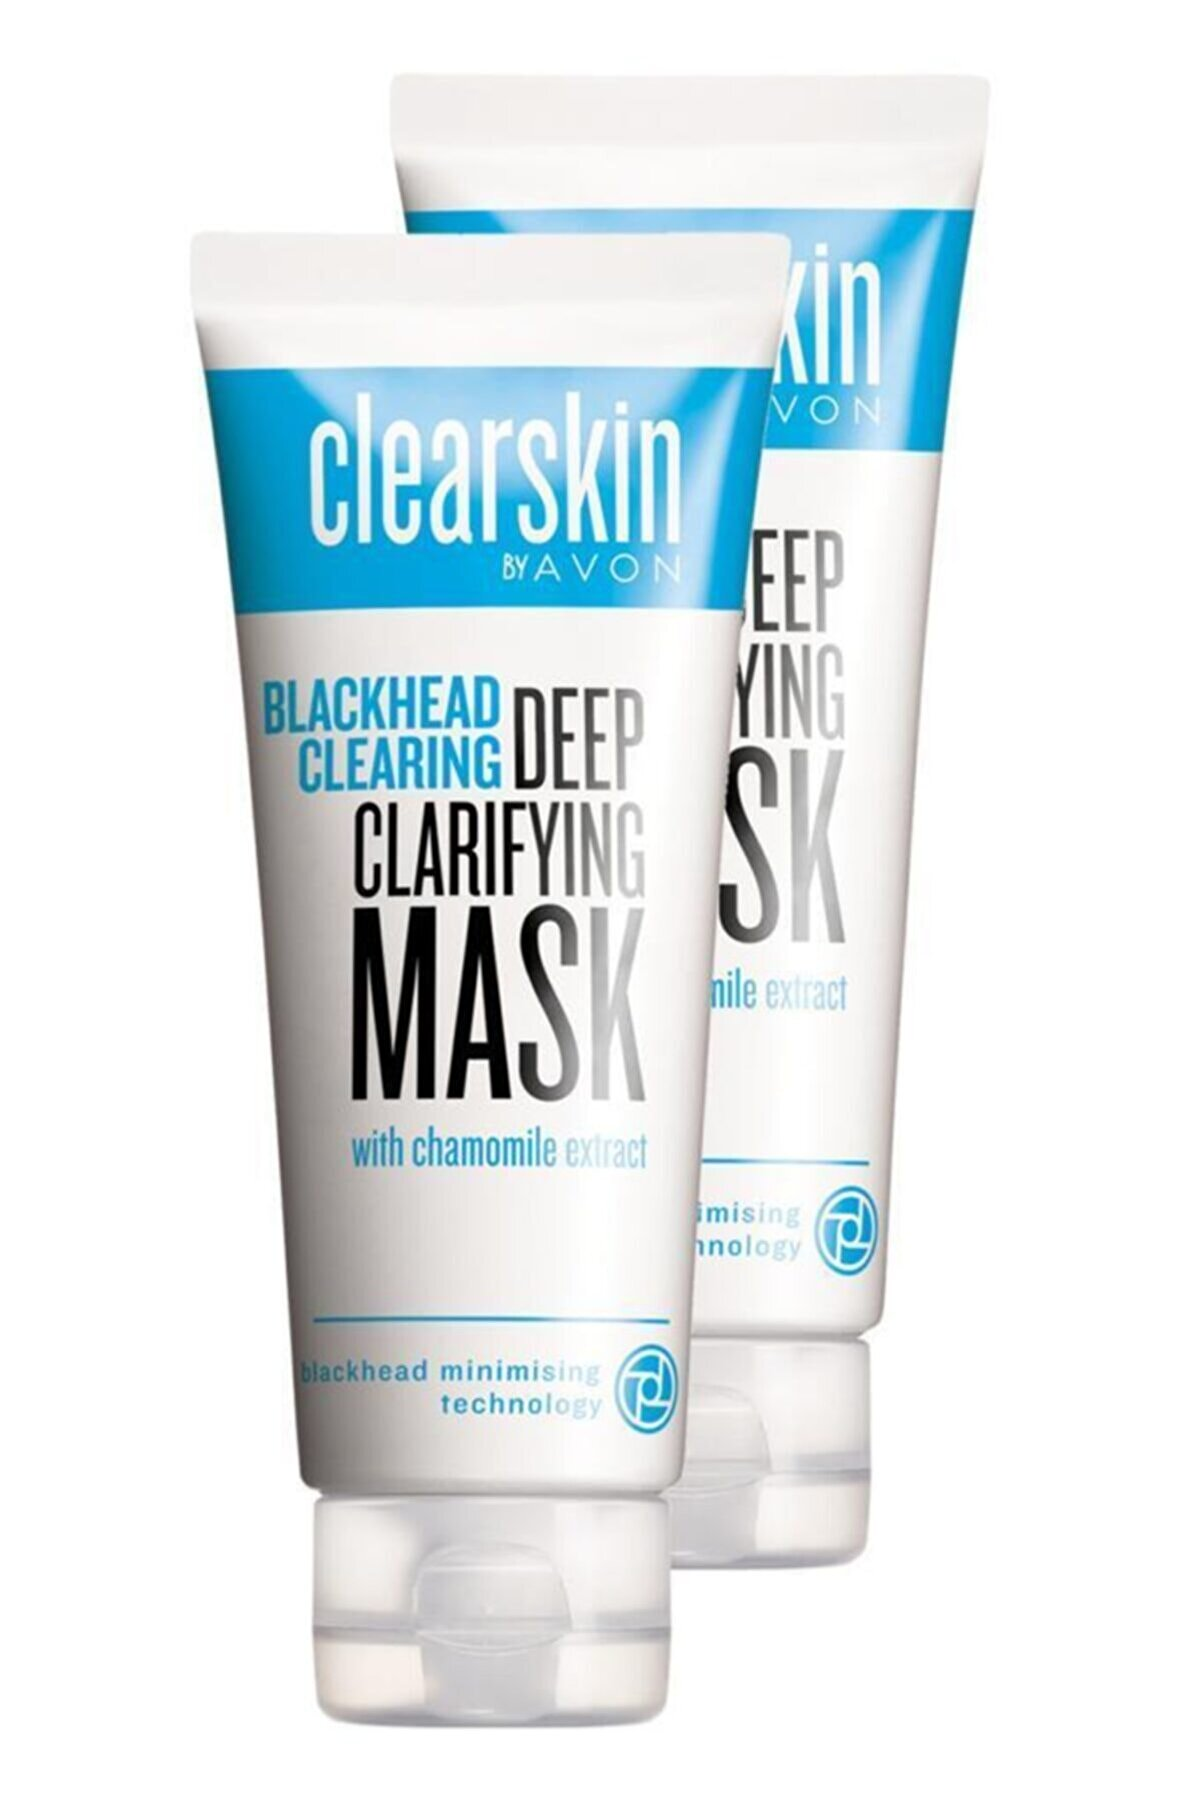 Avon Clearskin Siyah Noktalar Için Maske 75 Ml. Ikili Set